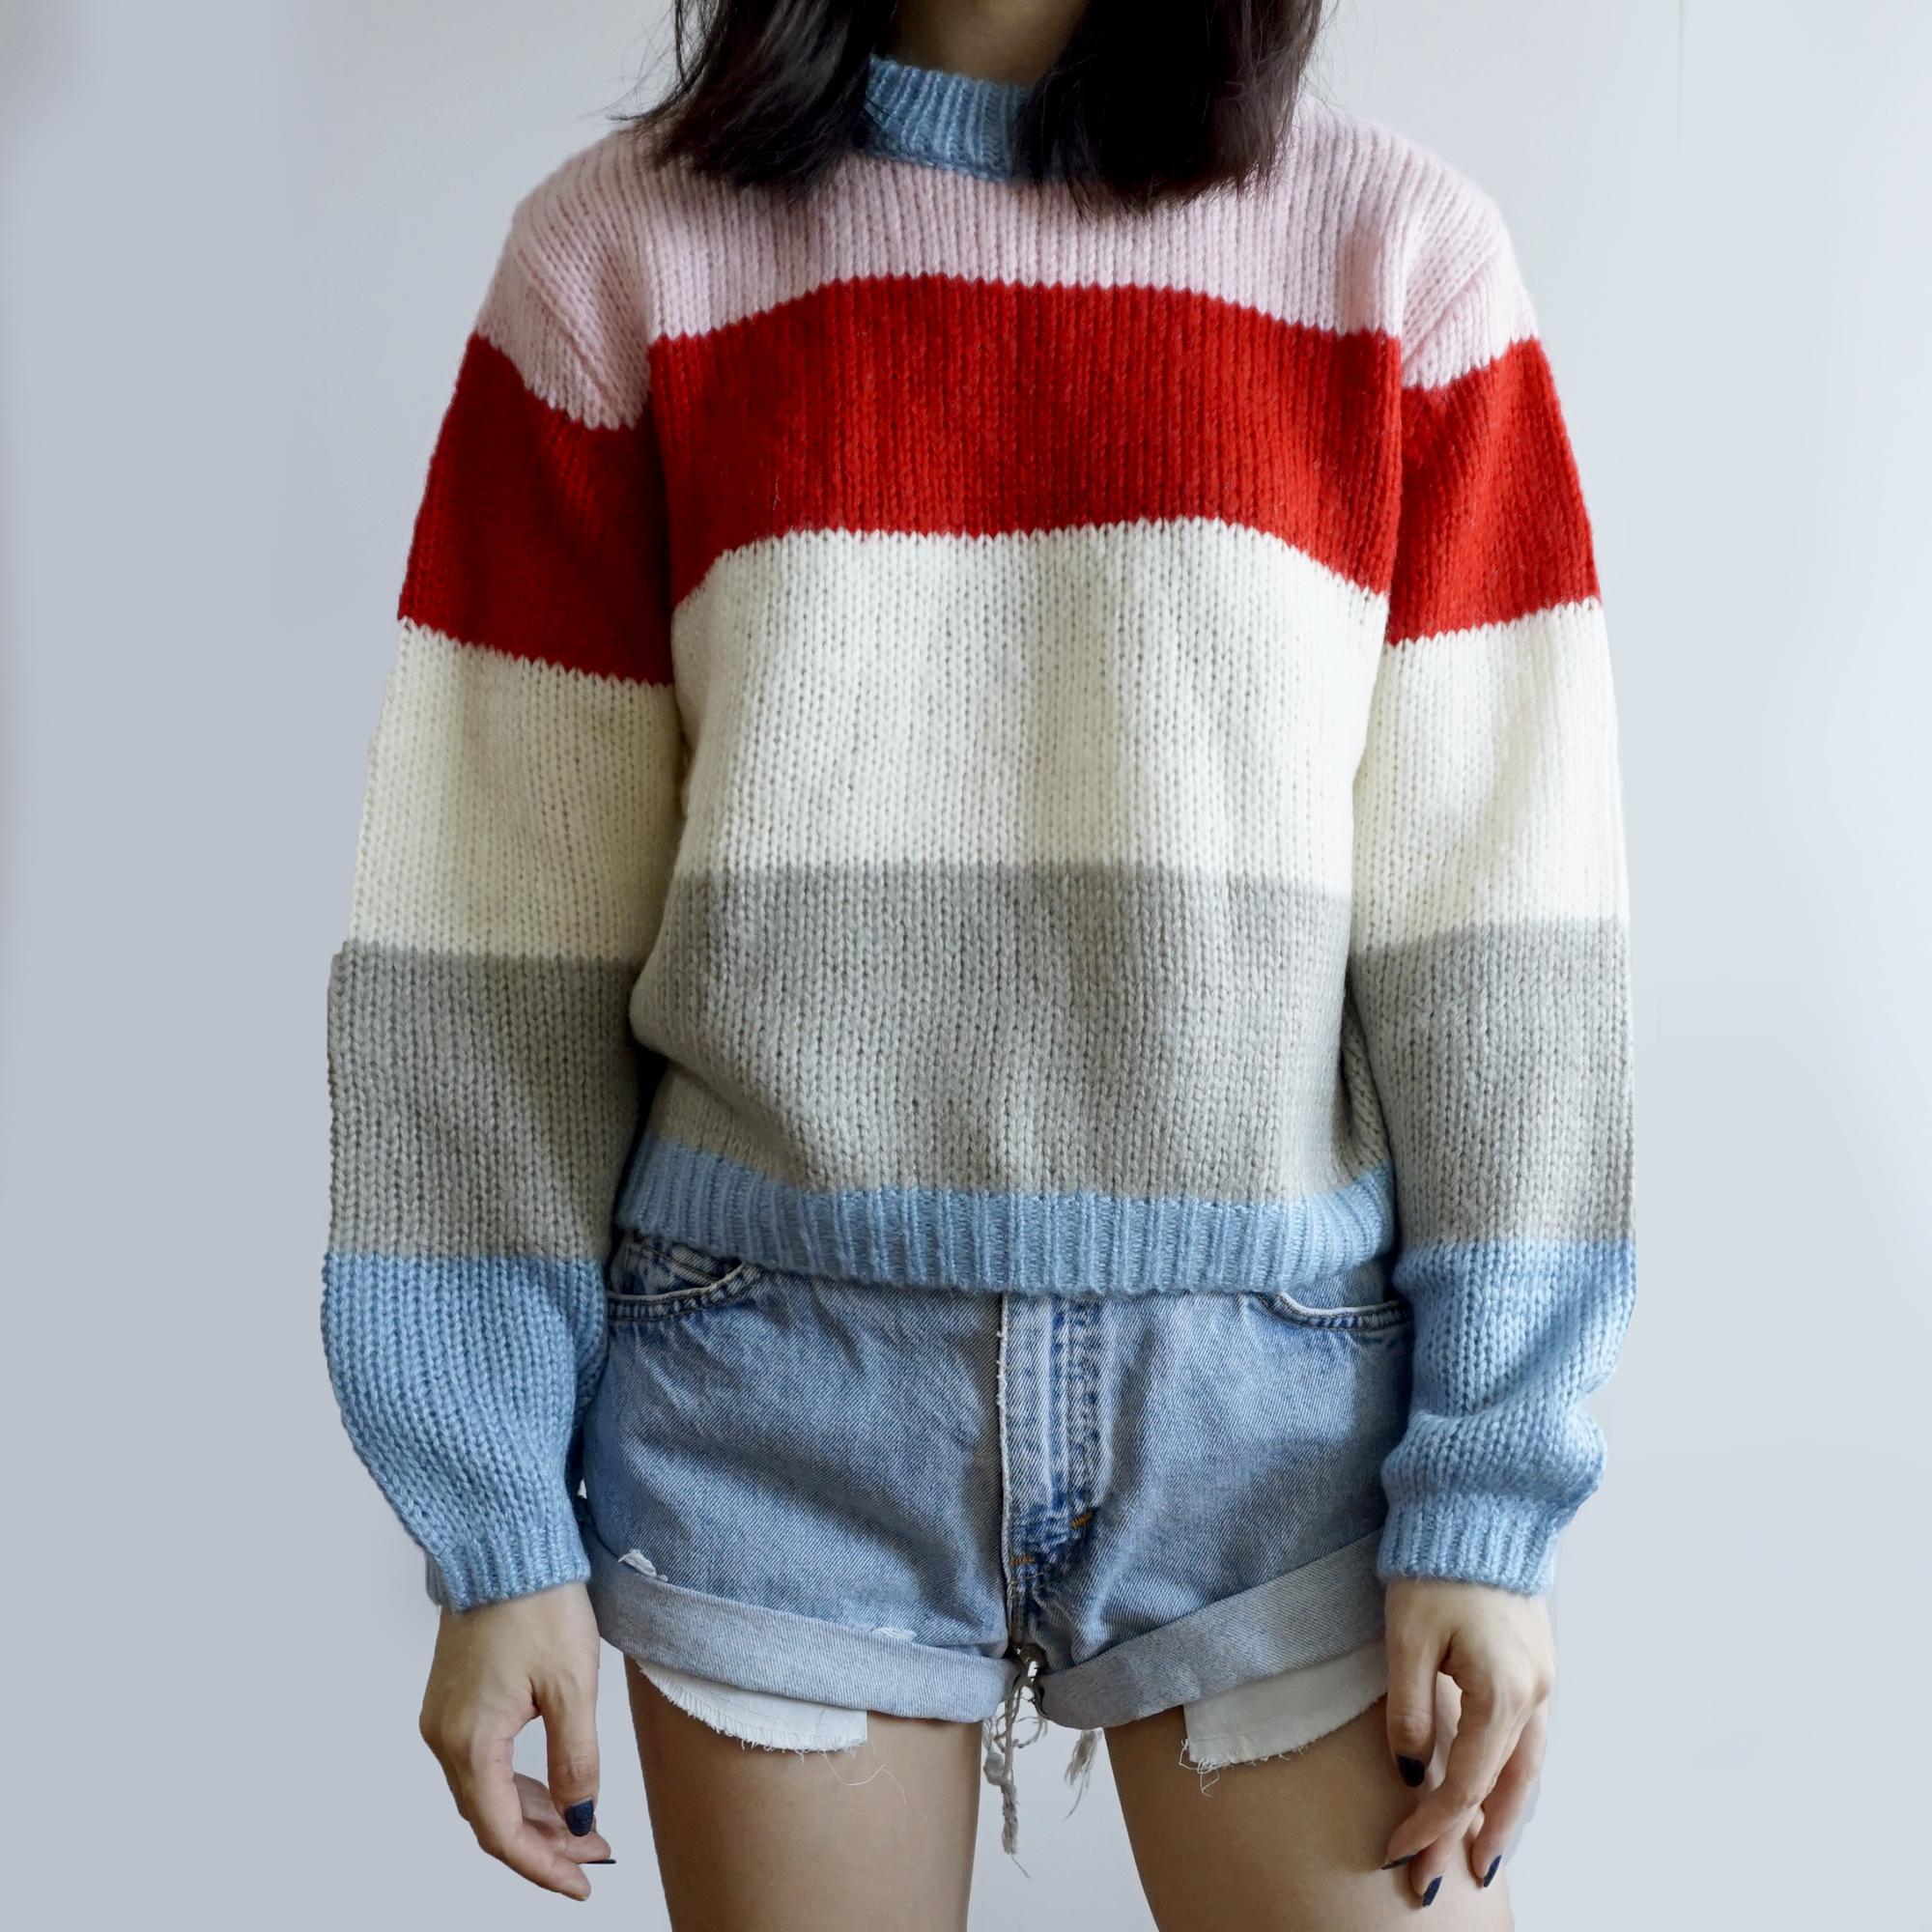 0fb7831a996 Colorblock Stripe Sweater (Pink/Blue) · Megoosta Fashion · Free ...